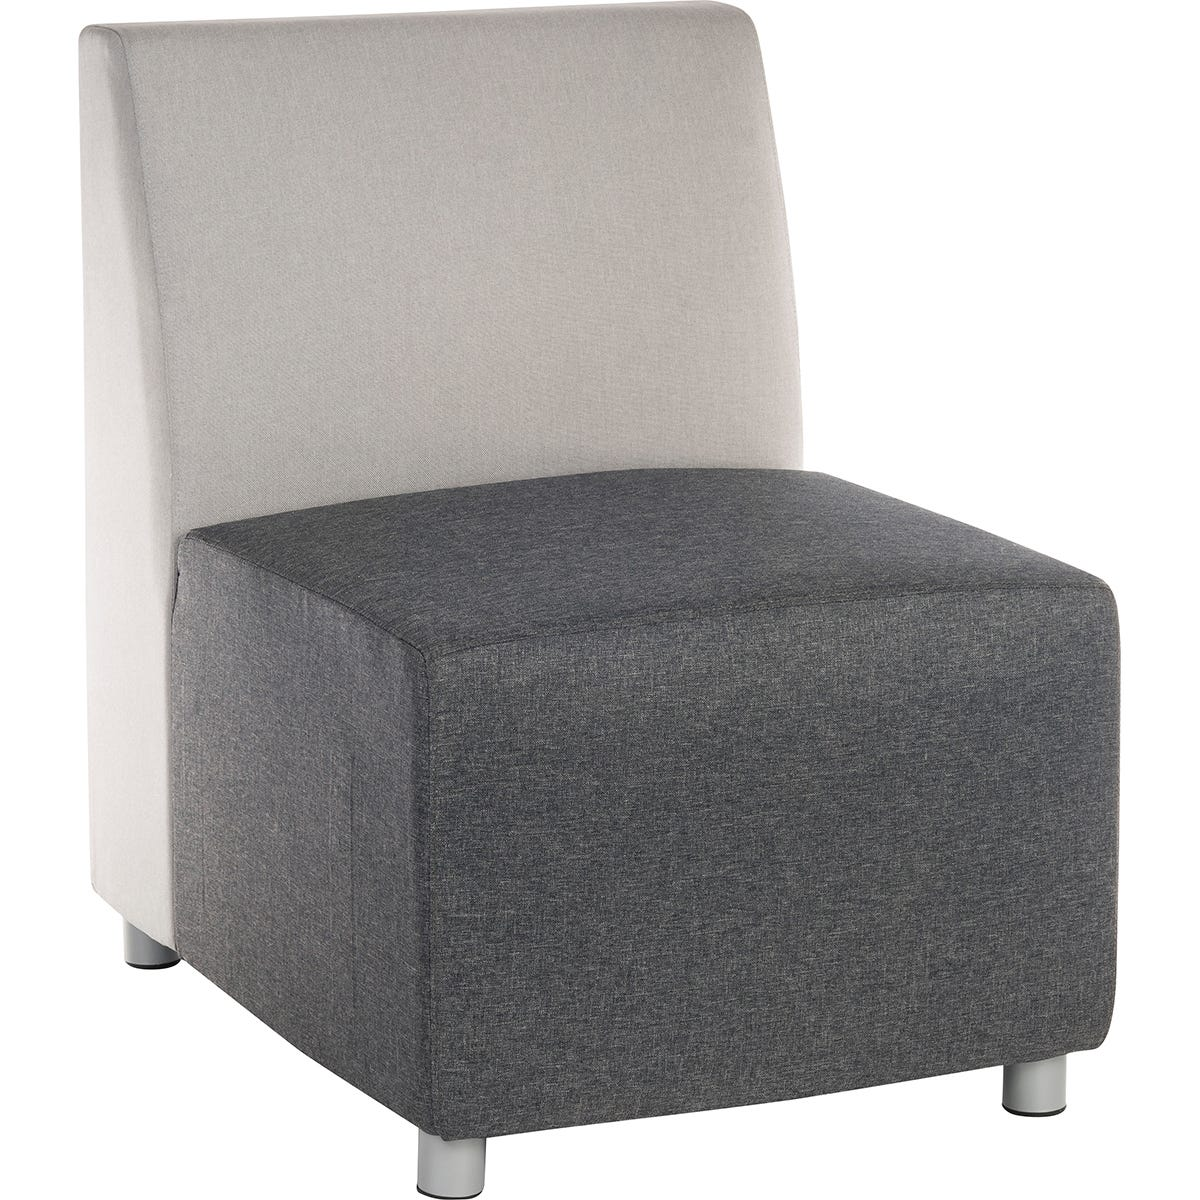 Teknik Cube Modular Reception Sofa - Dark Grey Chair